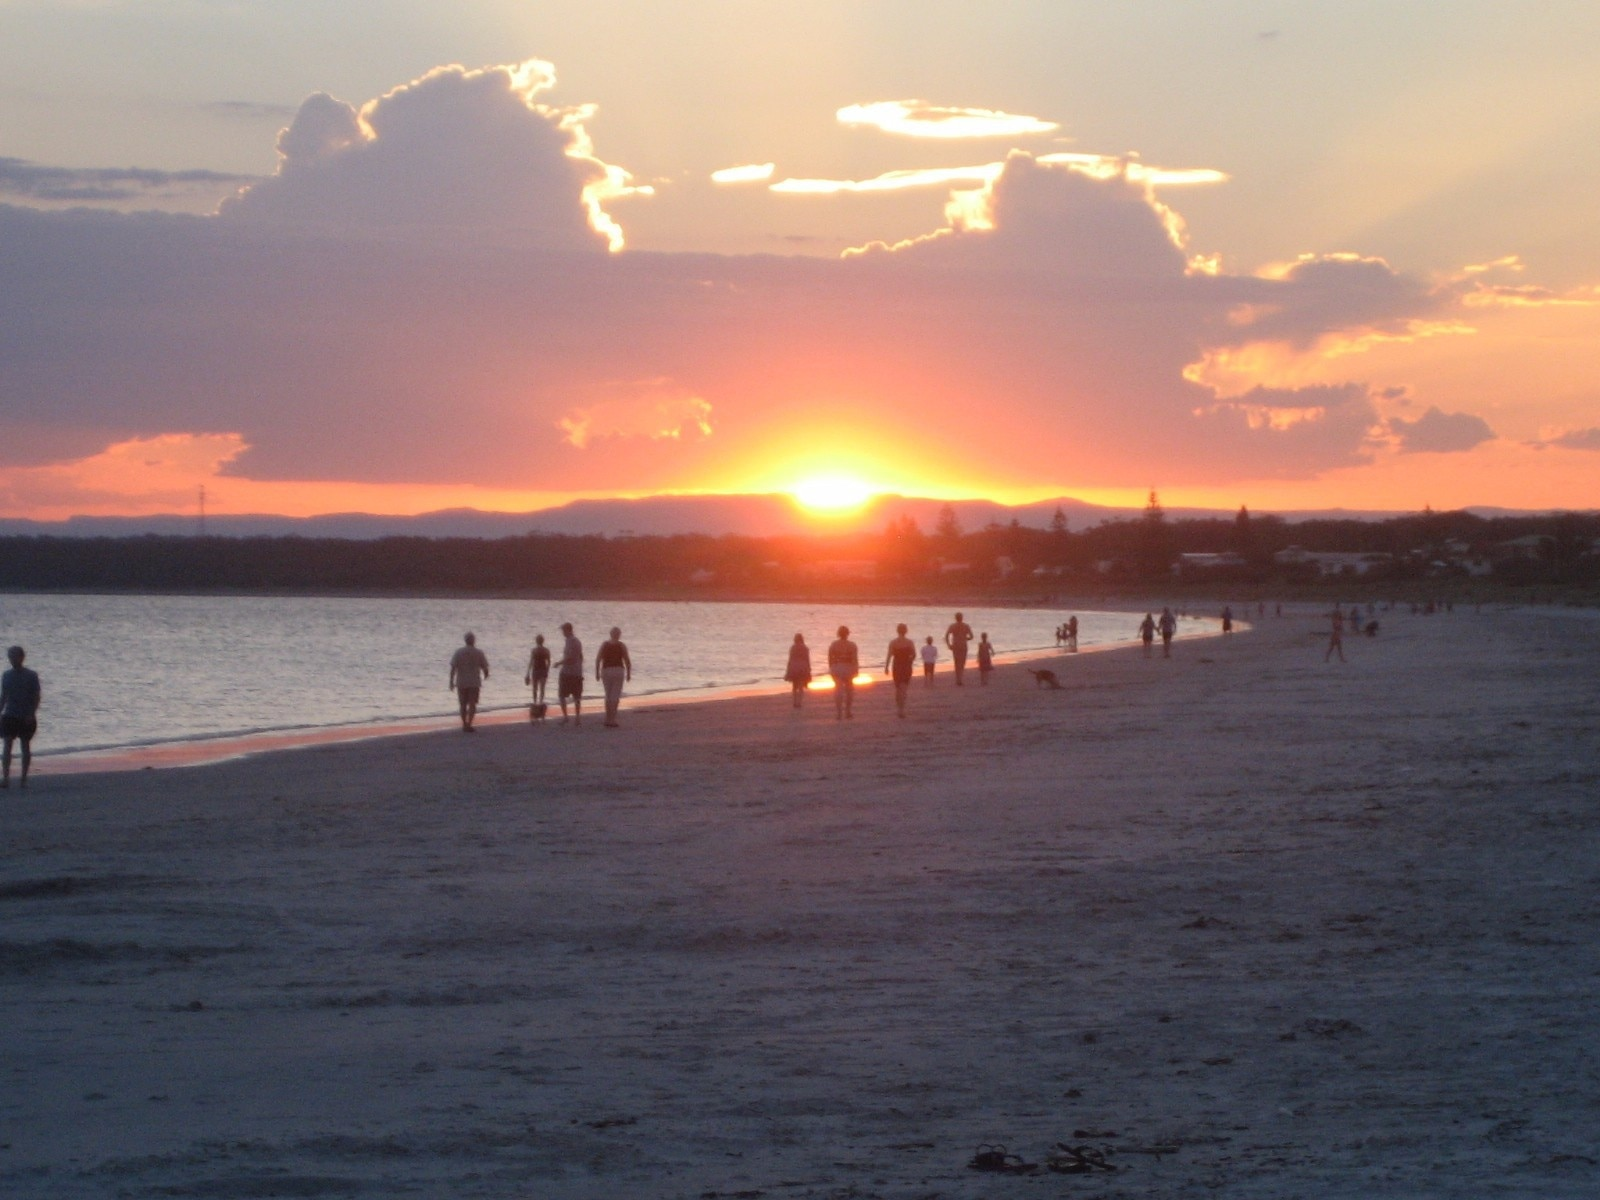 Callala Bay, New South Wales, Australia